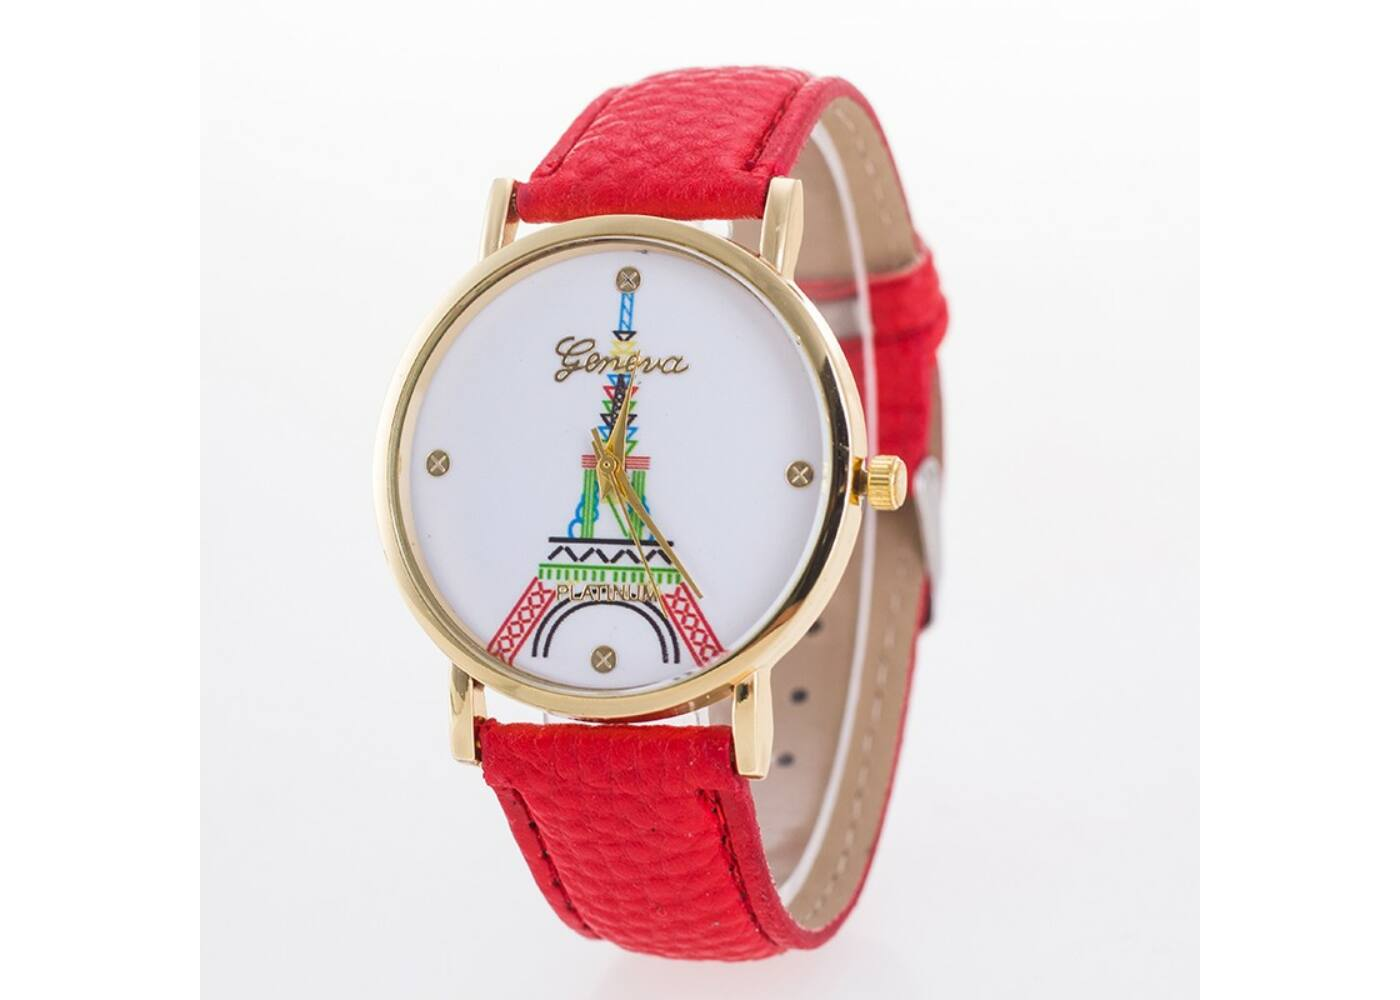 Geneva Eiffel-tornyos karóra e77884ddfe